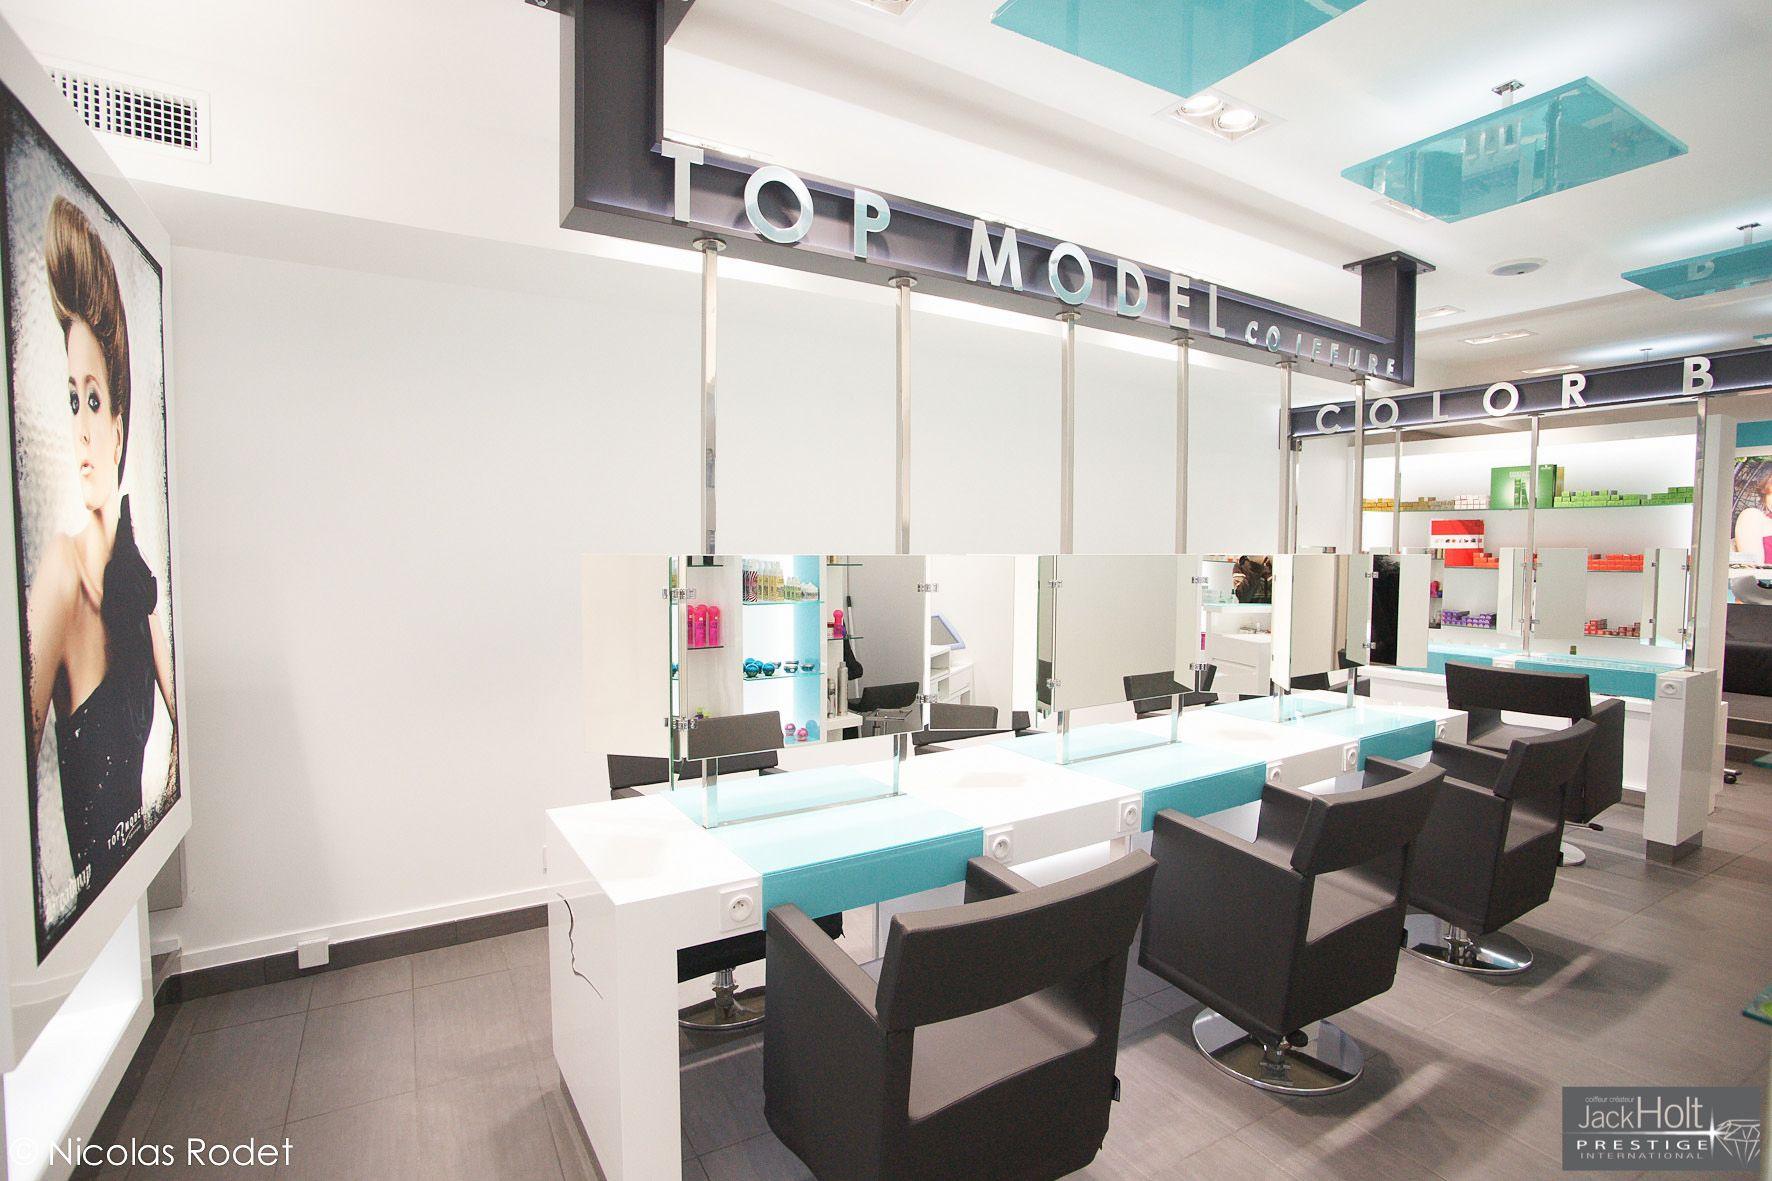 Salon De Coiffure Confidences Prestige Lyon Top Model Rehome Salon De Coiffure Petit Salon De Coiffure Salon Lyon